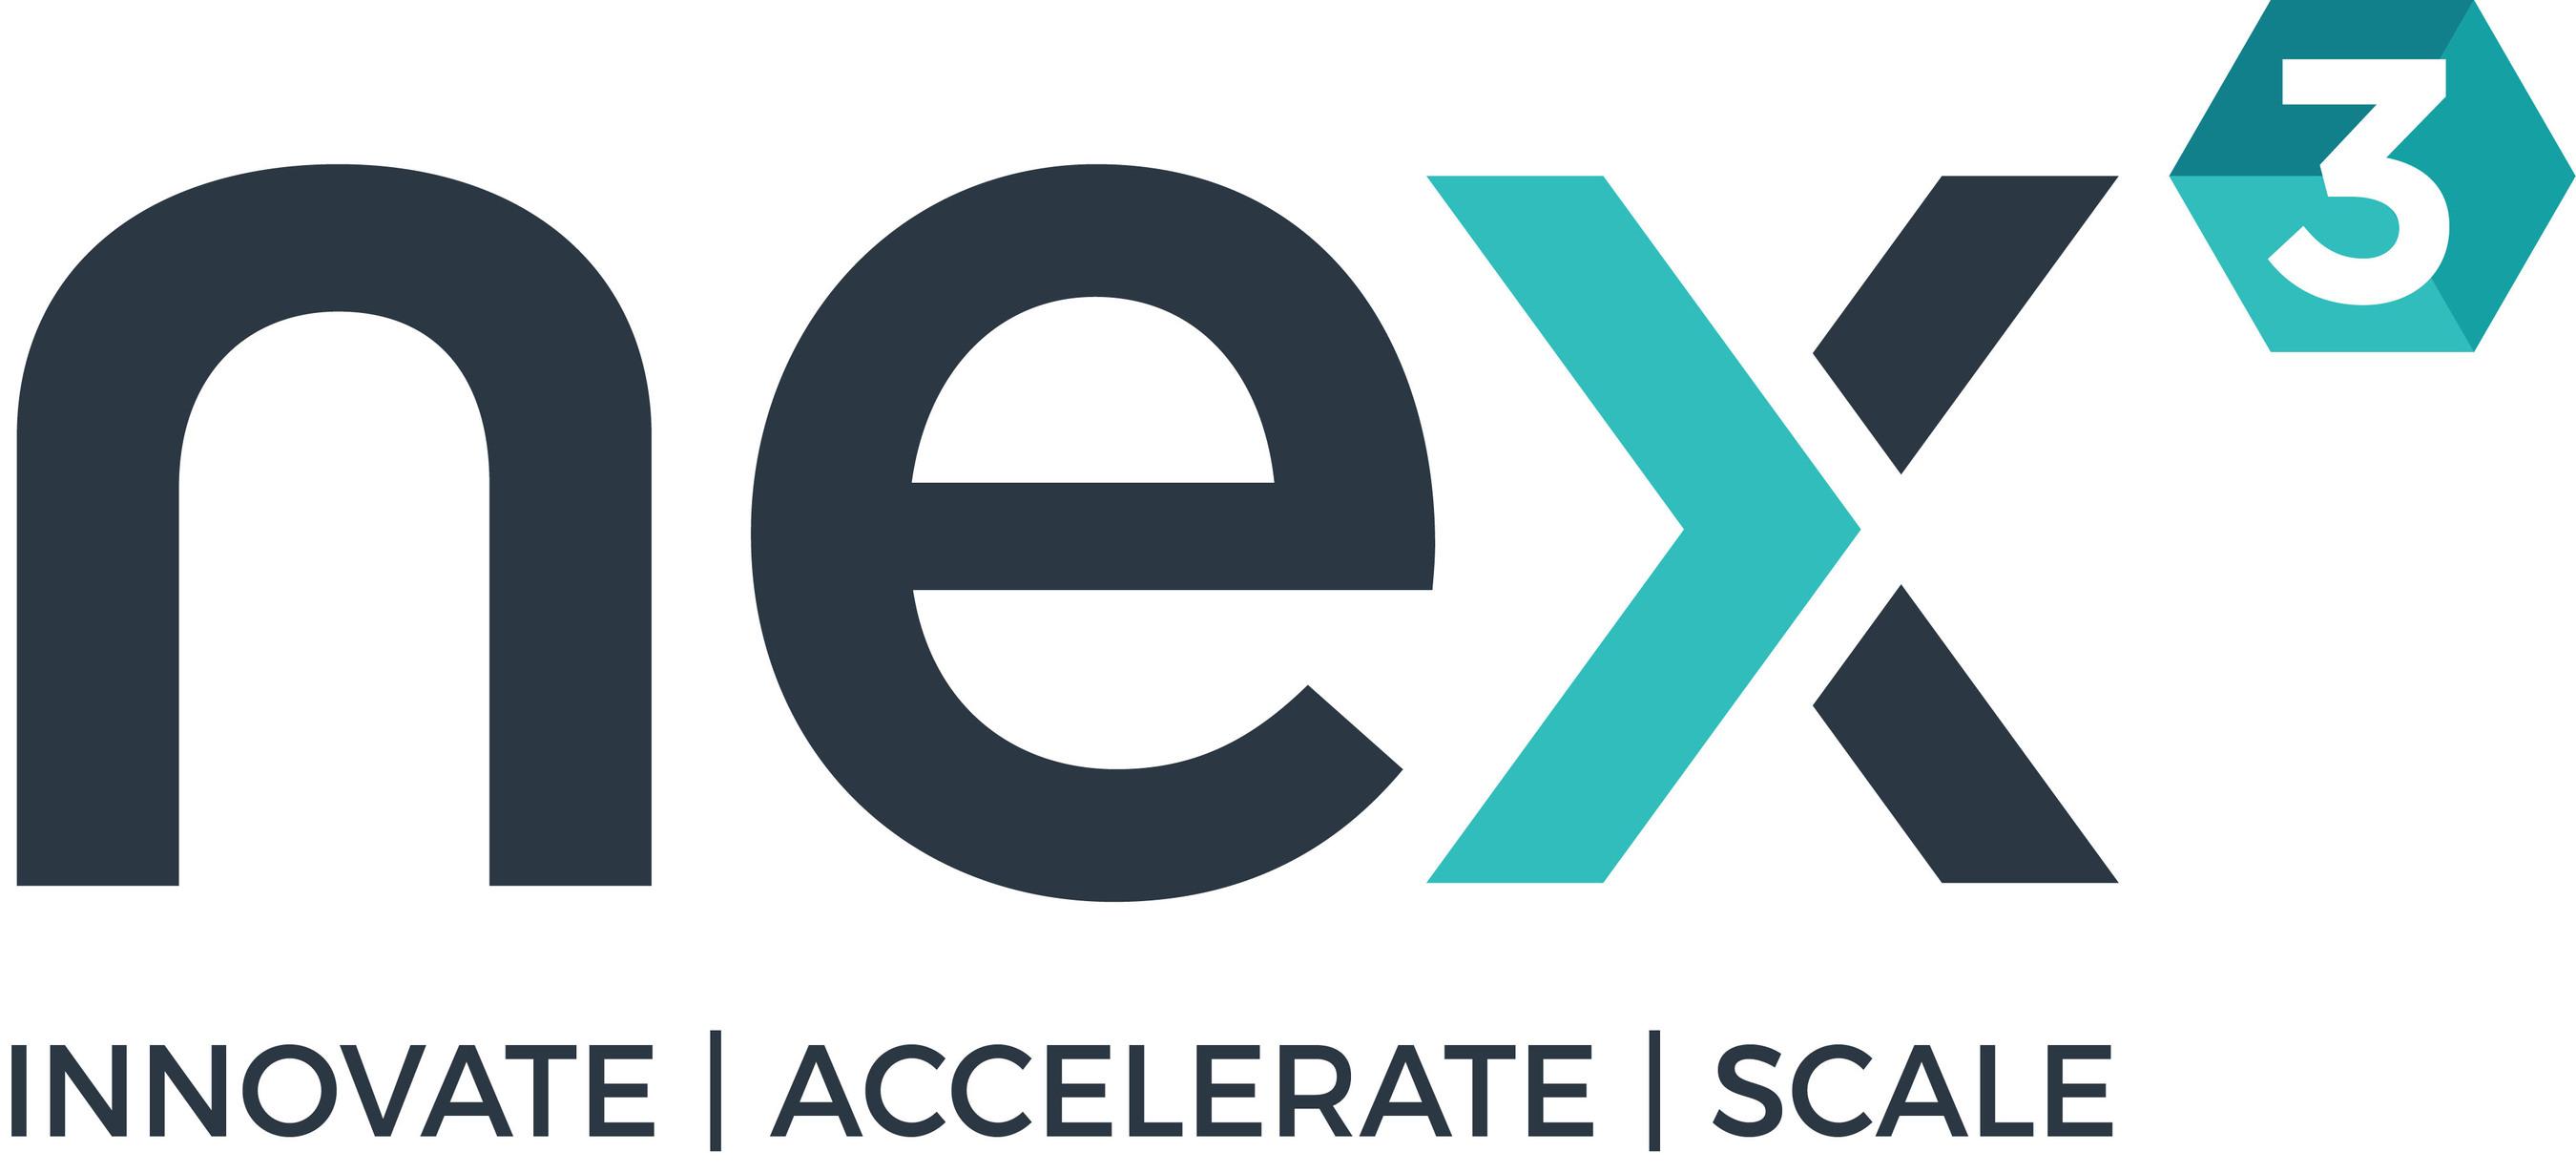 Nex Cubed Announces Franklin Templeton as a Founding Partner for HBCU Founder's Program